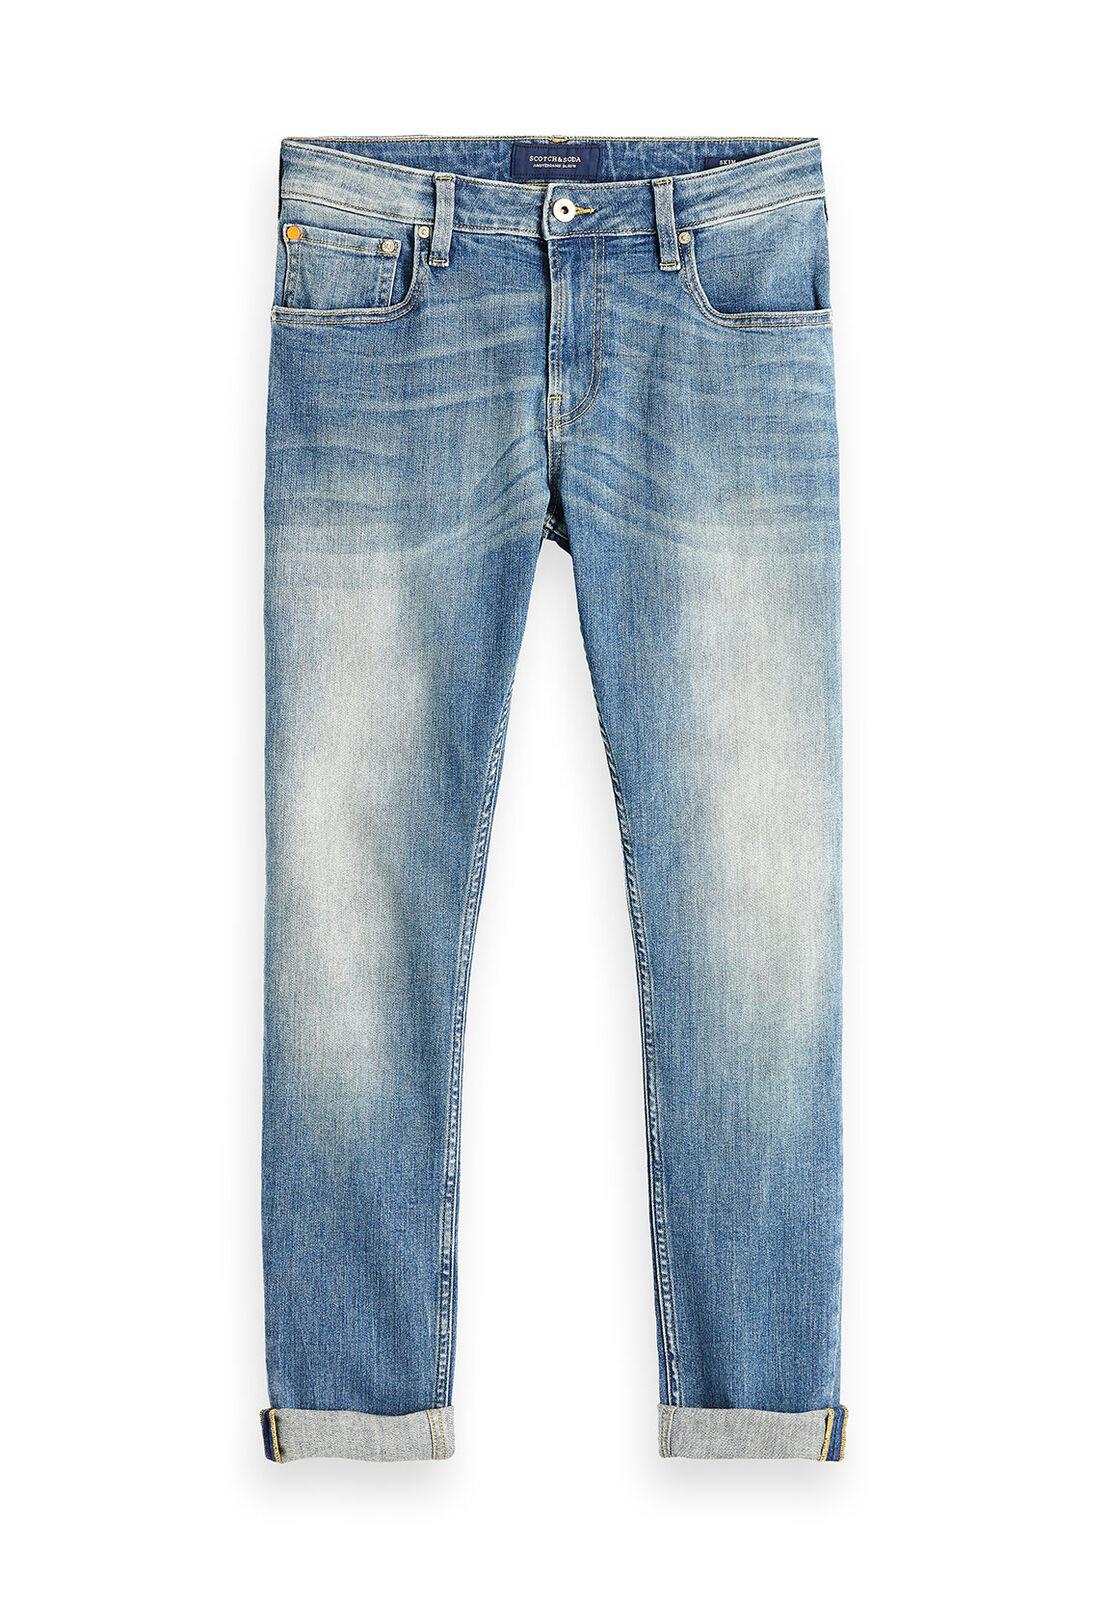 Scotch & Soda Jeans Men Skim 148650 Greener than 2648